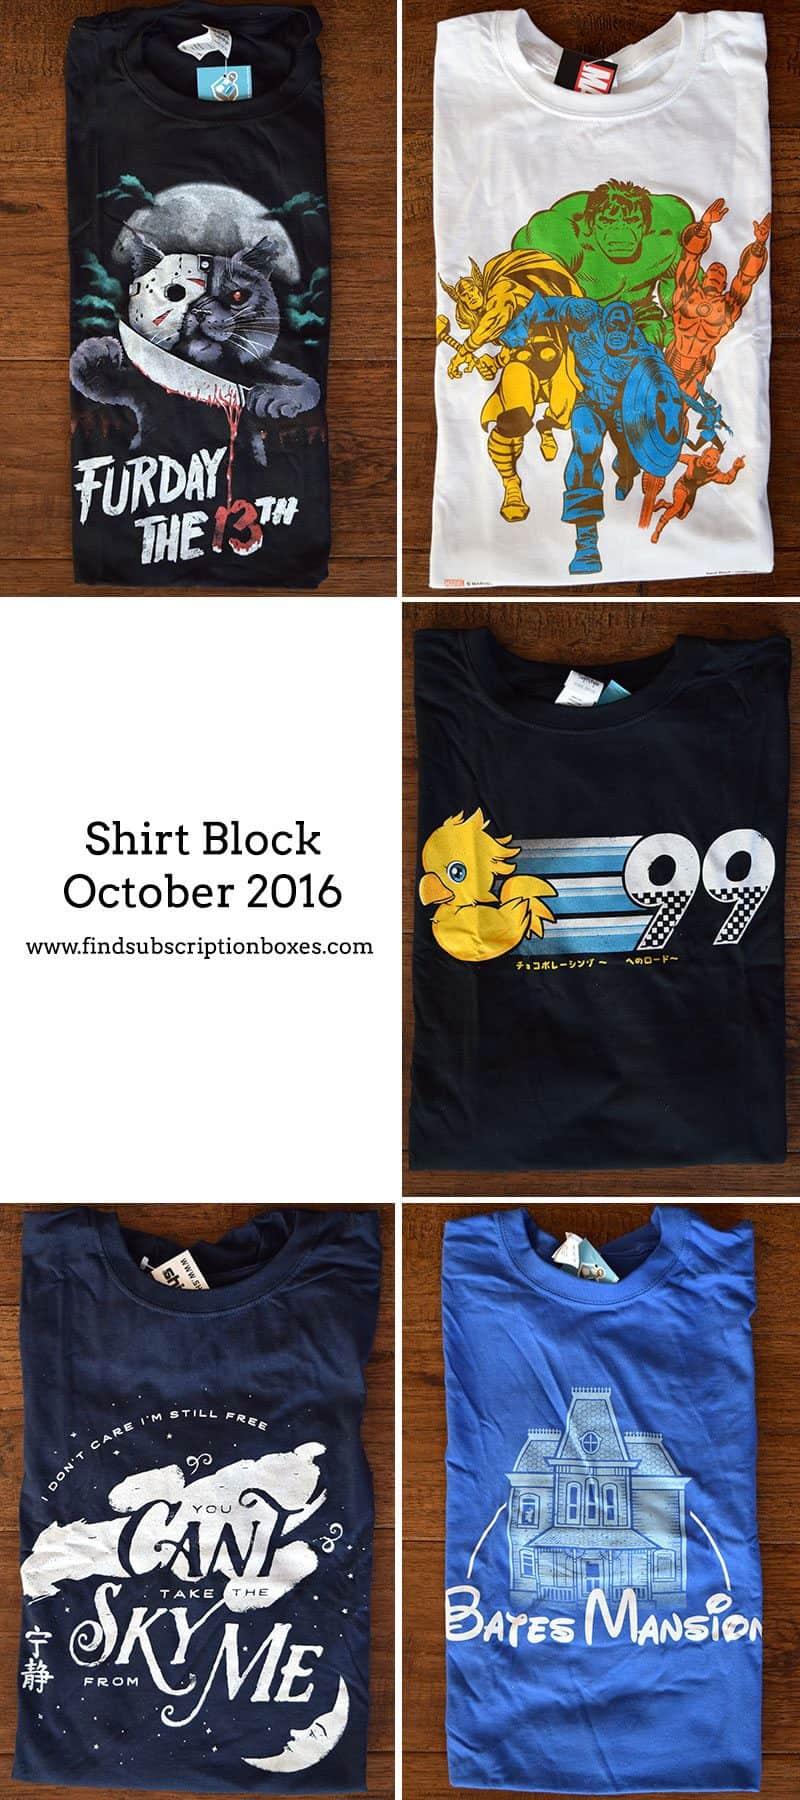 October 2016 Shirt Block Review - Inside the Box